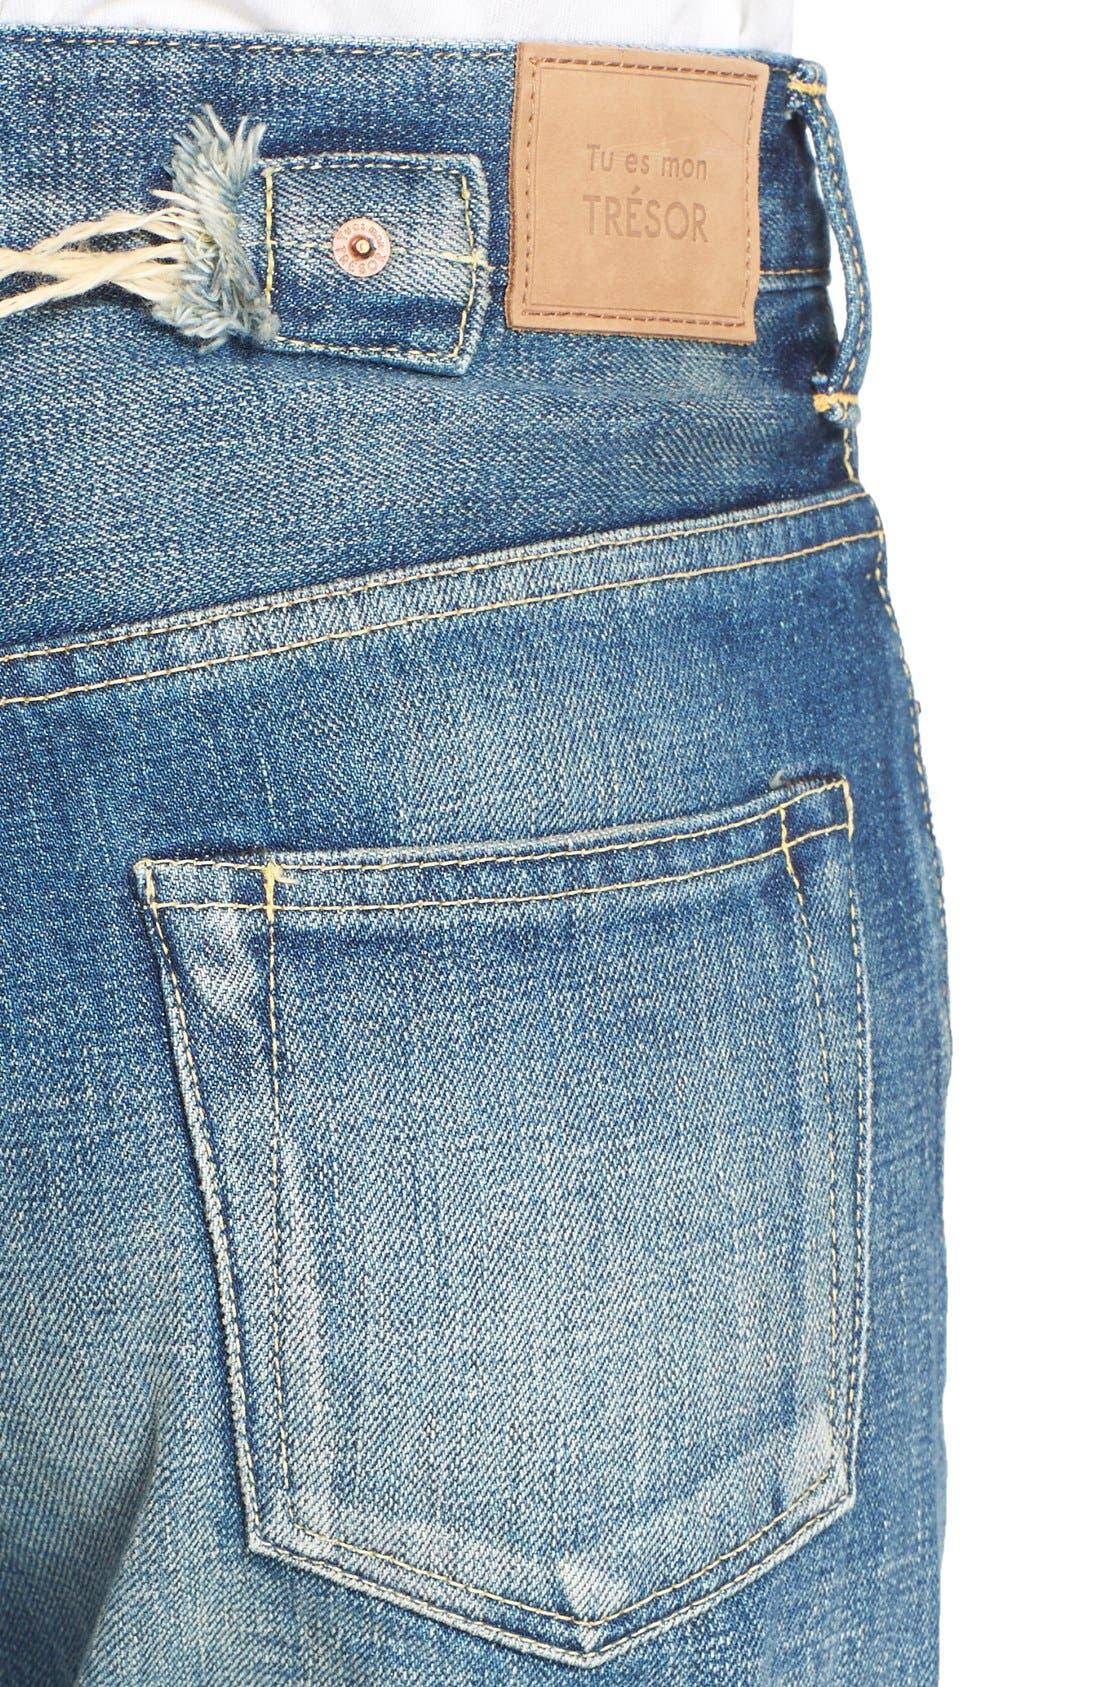 Alternate Image 6  - Tu es mon TRÉSOR Imitation Pearl Embellished Jeans